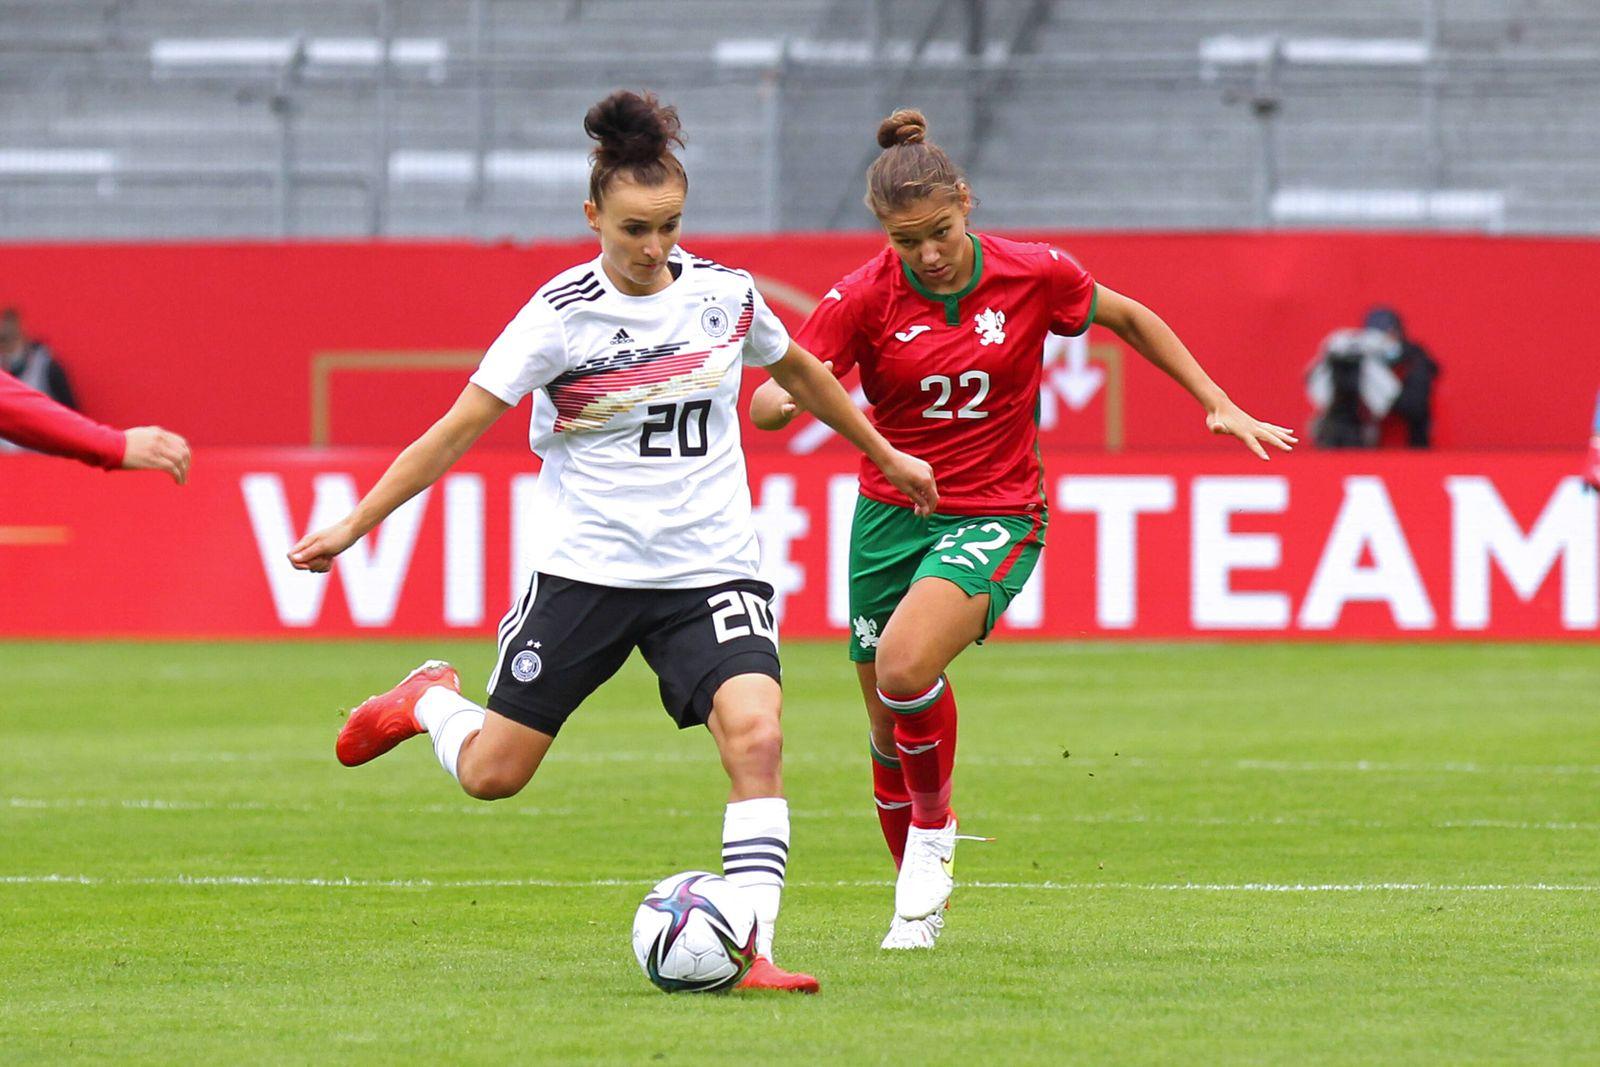 WM-Qualifikation Frauen: Deutschland vs. Bulgarien, 18.09.21 Fussball, WM-Qualifikation Frauen: Deutschland vs. Bulgari